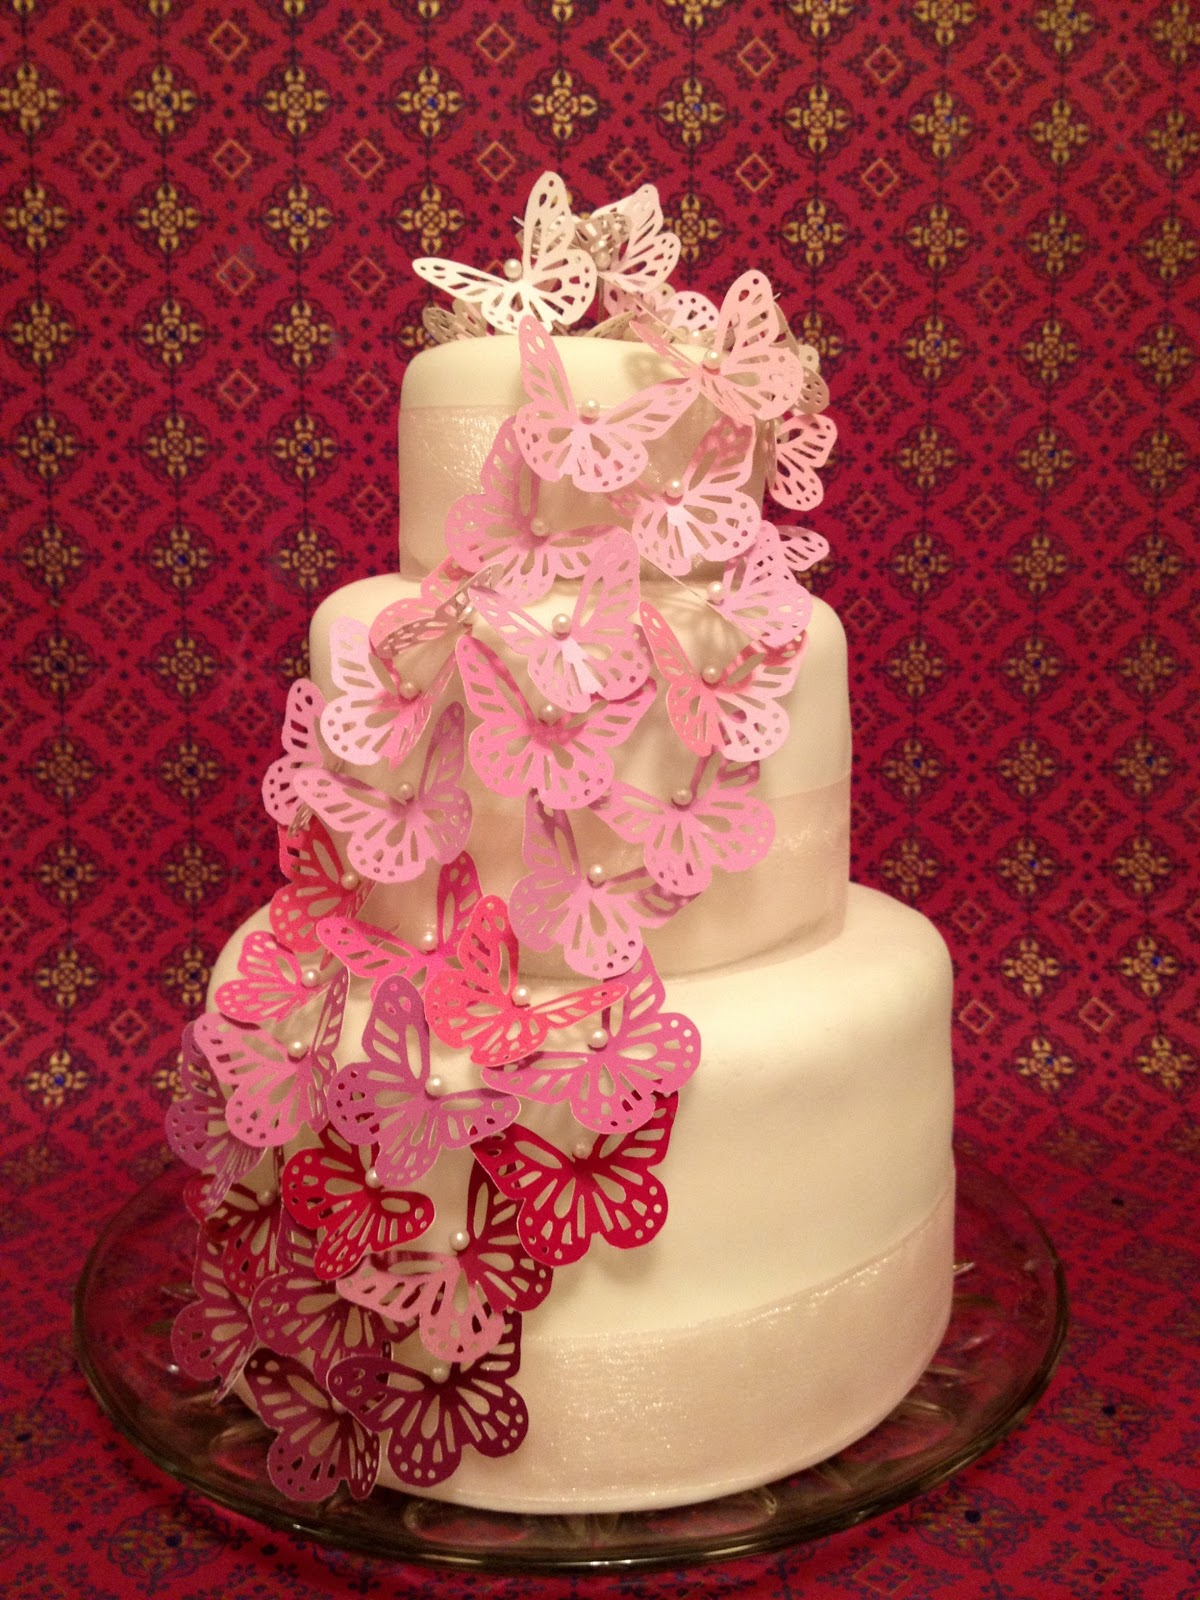 Easy U0026 Elegant Wedding Cake You Can Make Yourself For Under $50